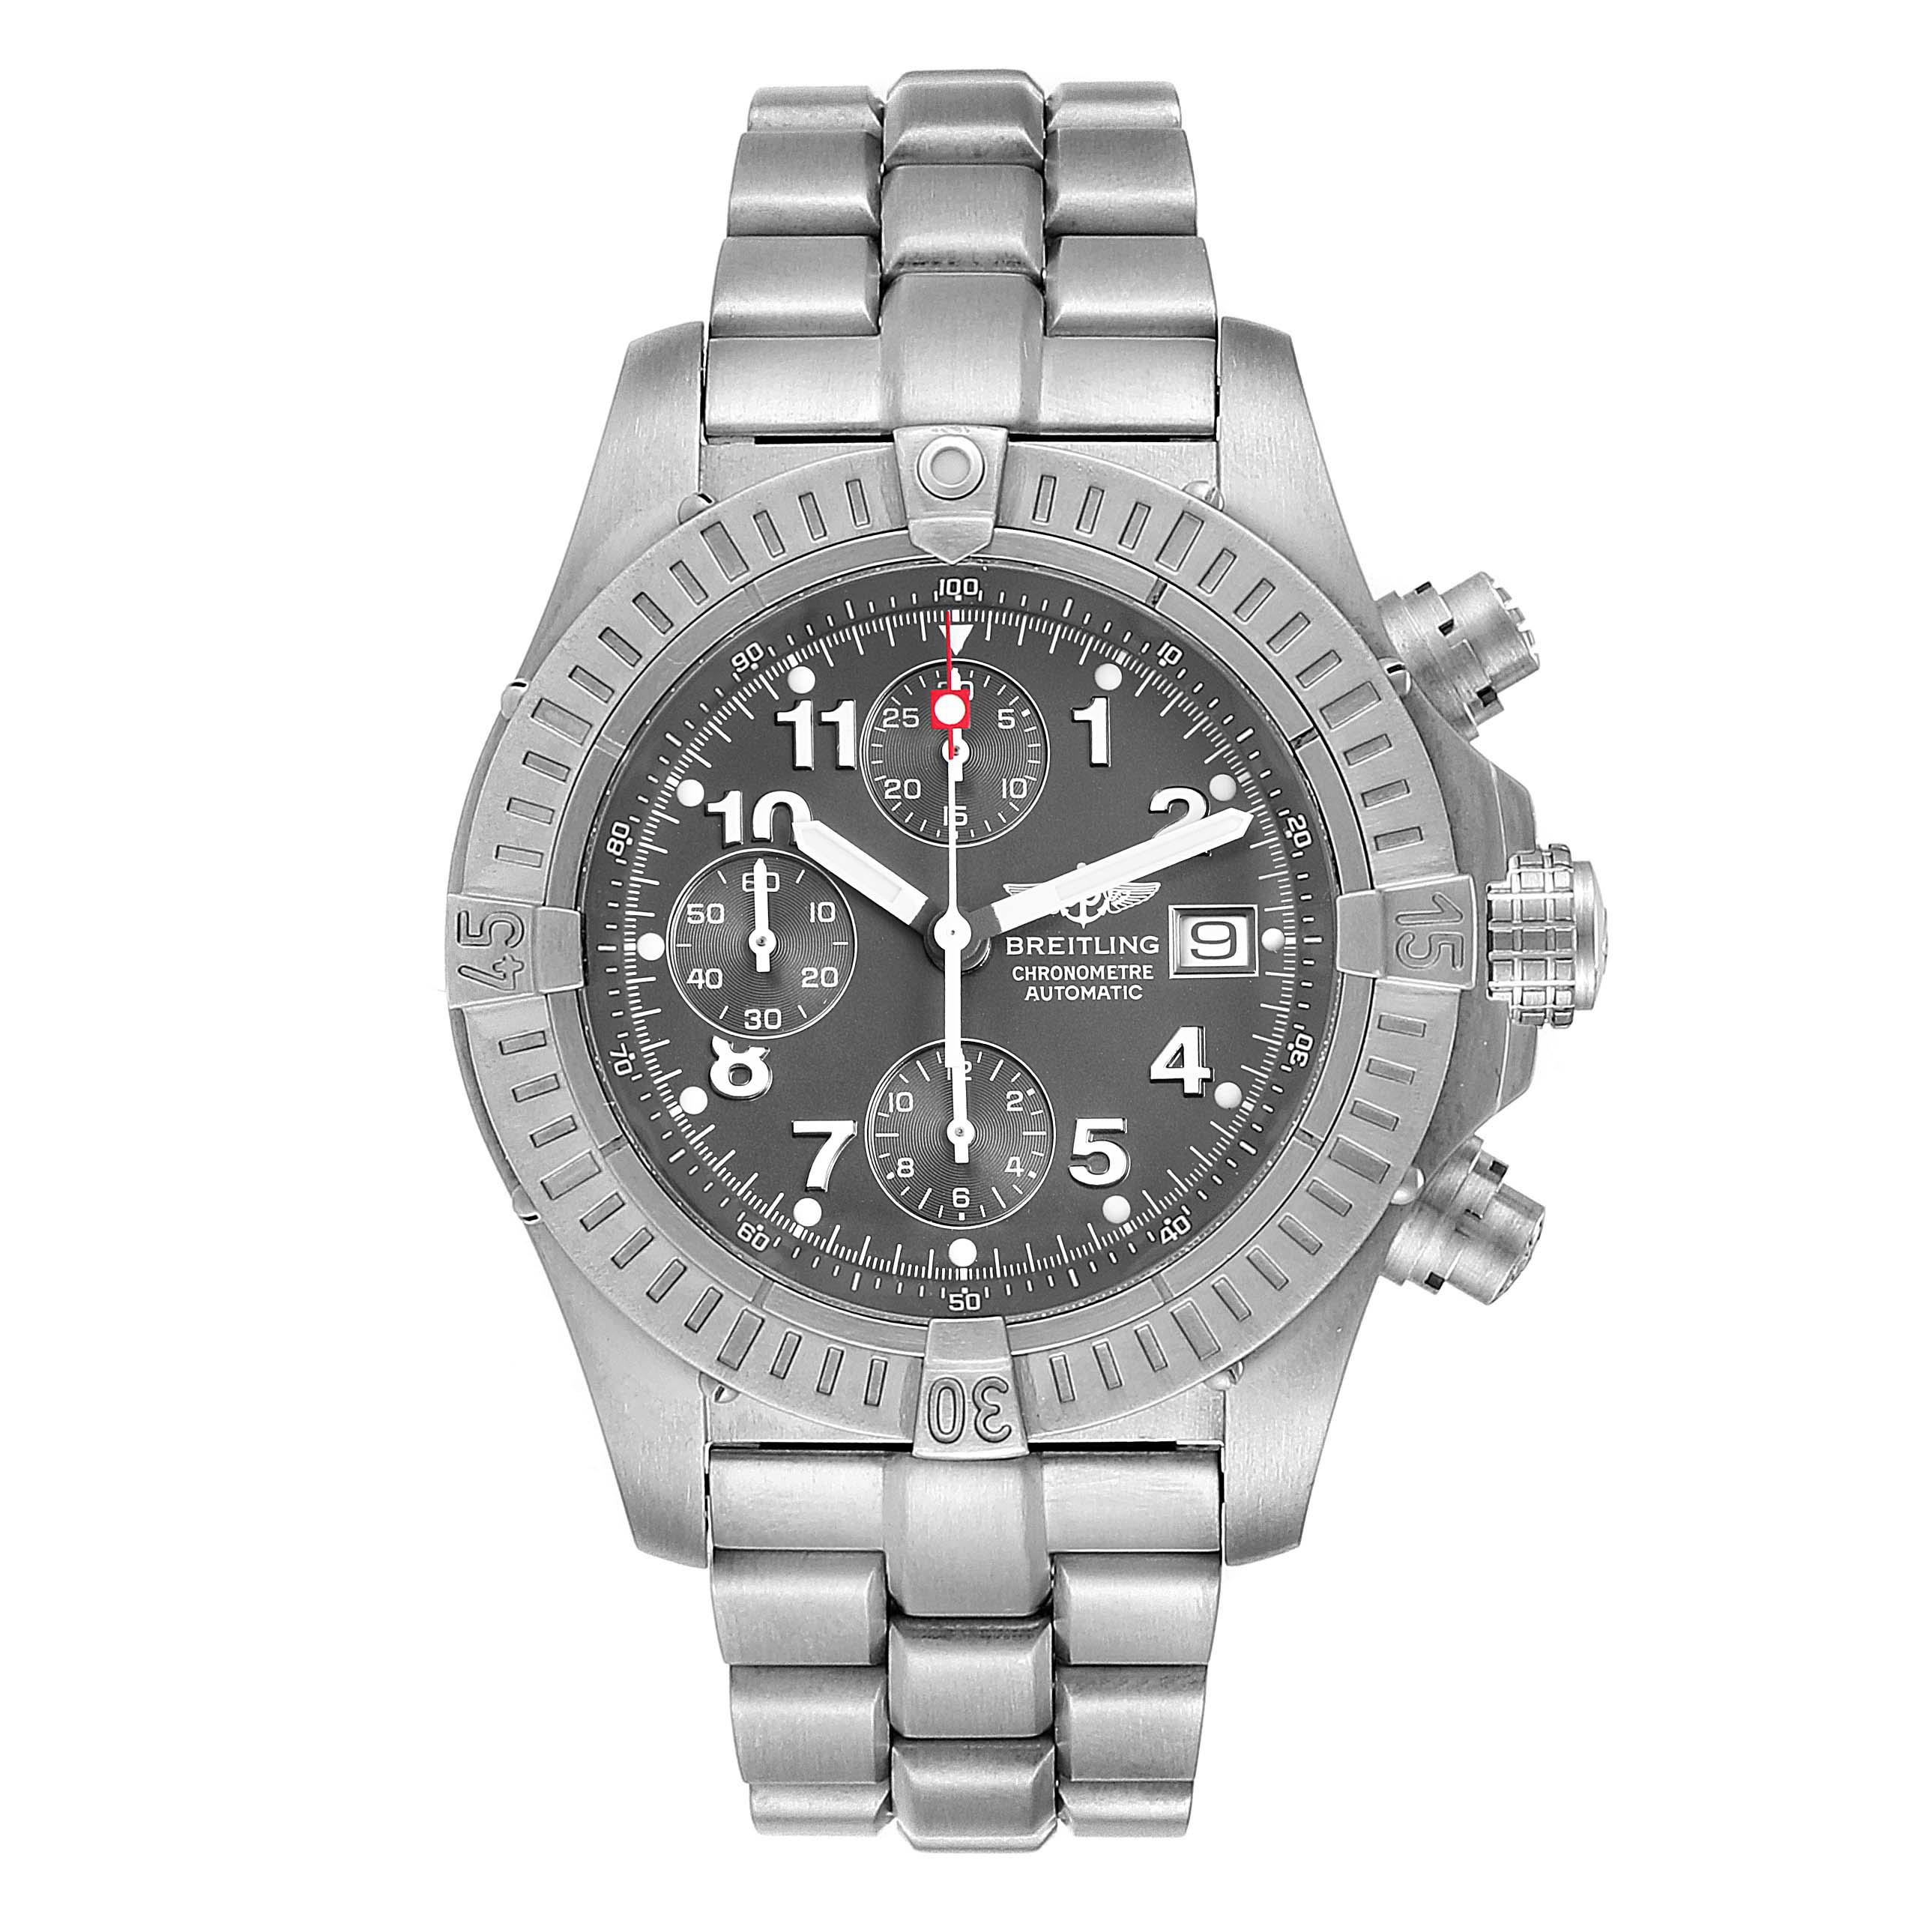 Breitling Aeromarine Avenger Chronograph Titanium Mens Watch E13360 SwissWatchExpo